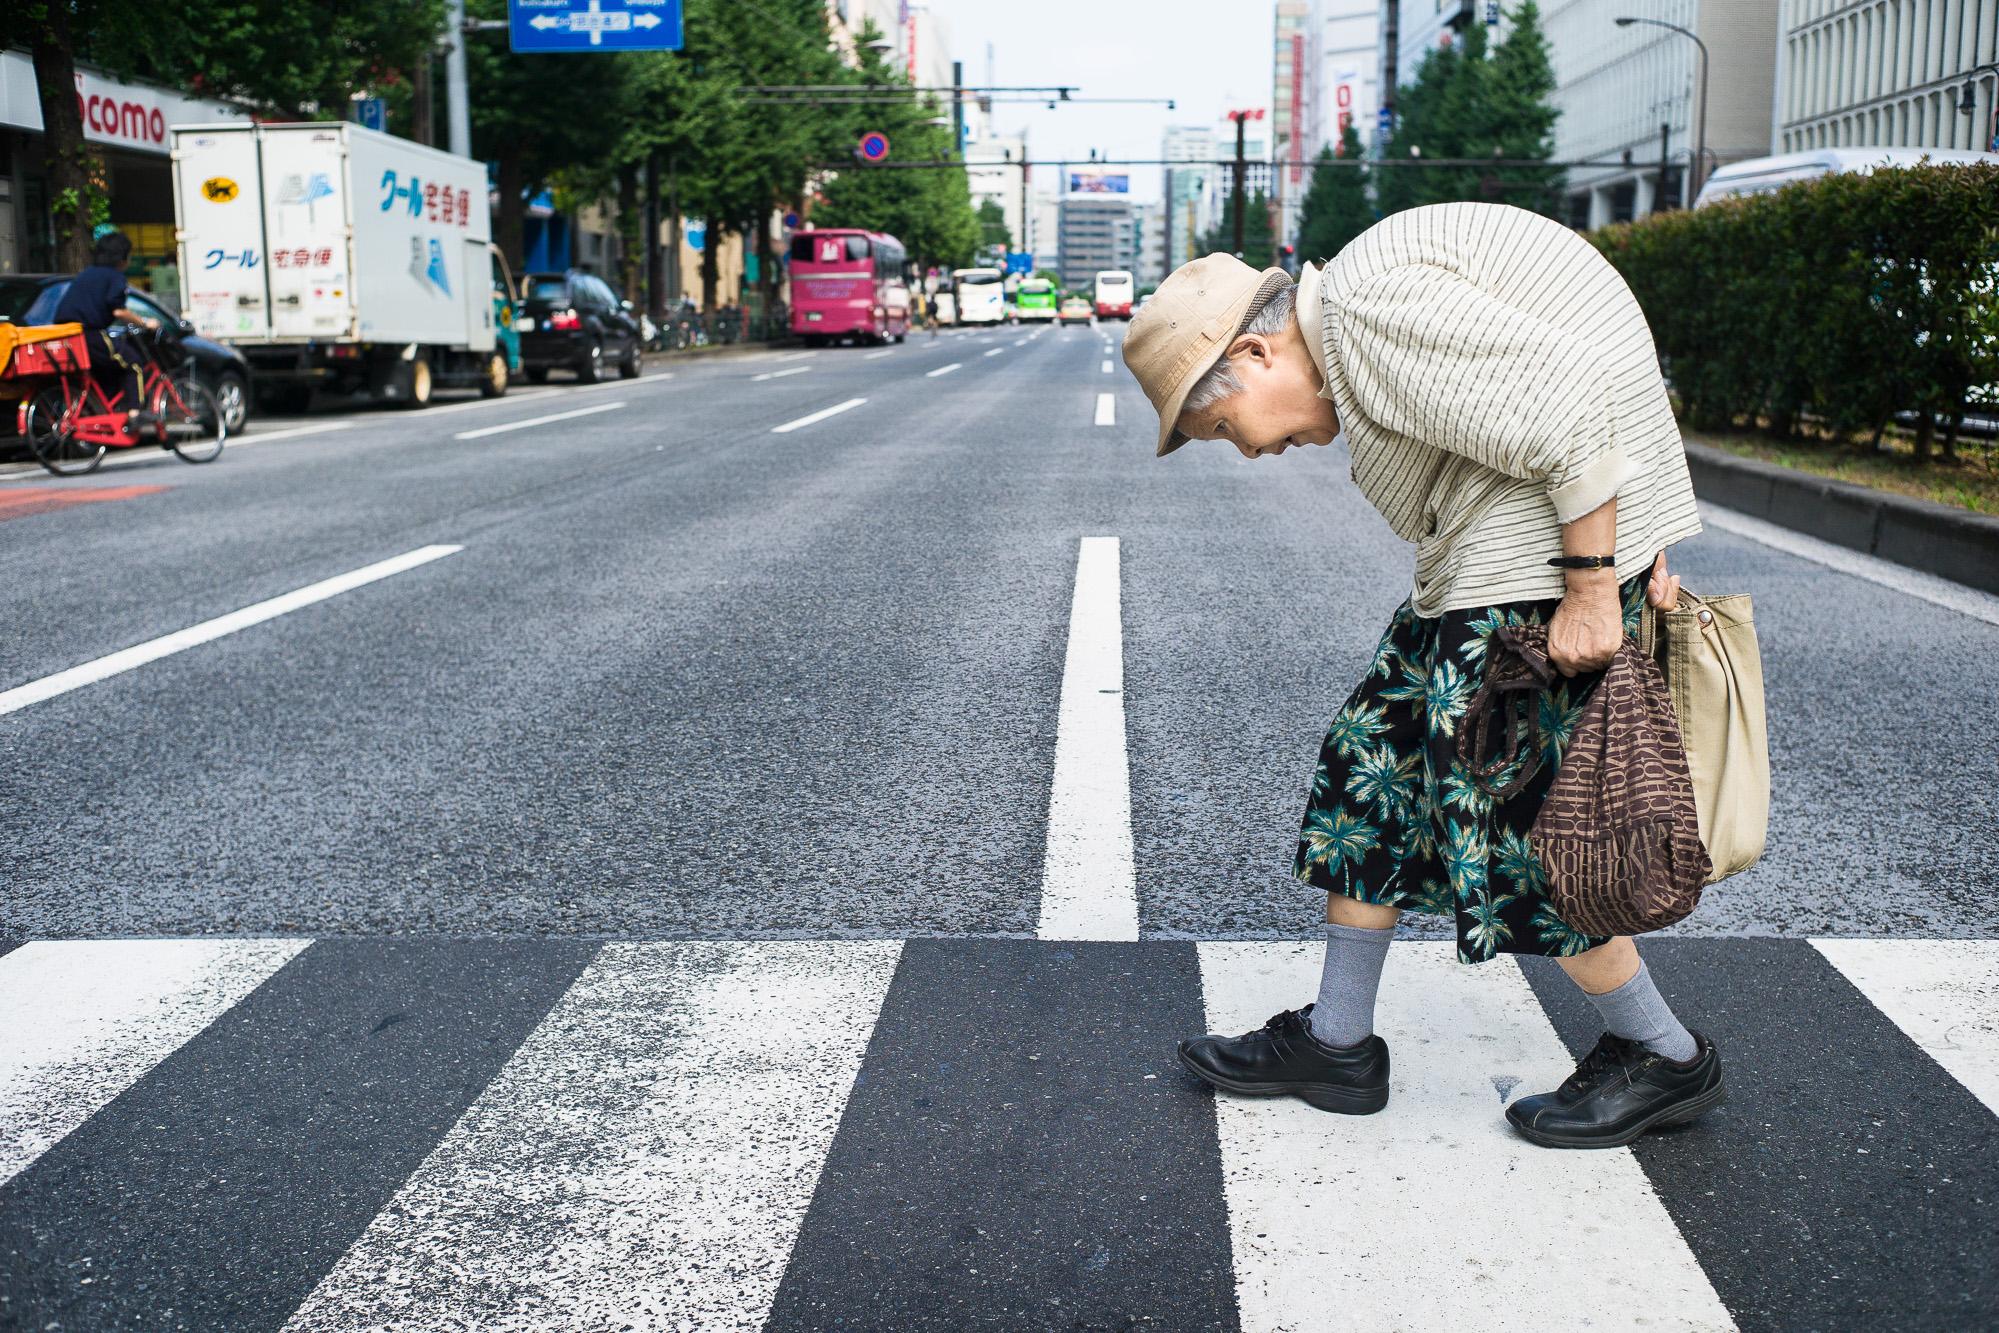 TokyoTimes.org